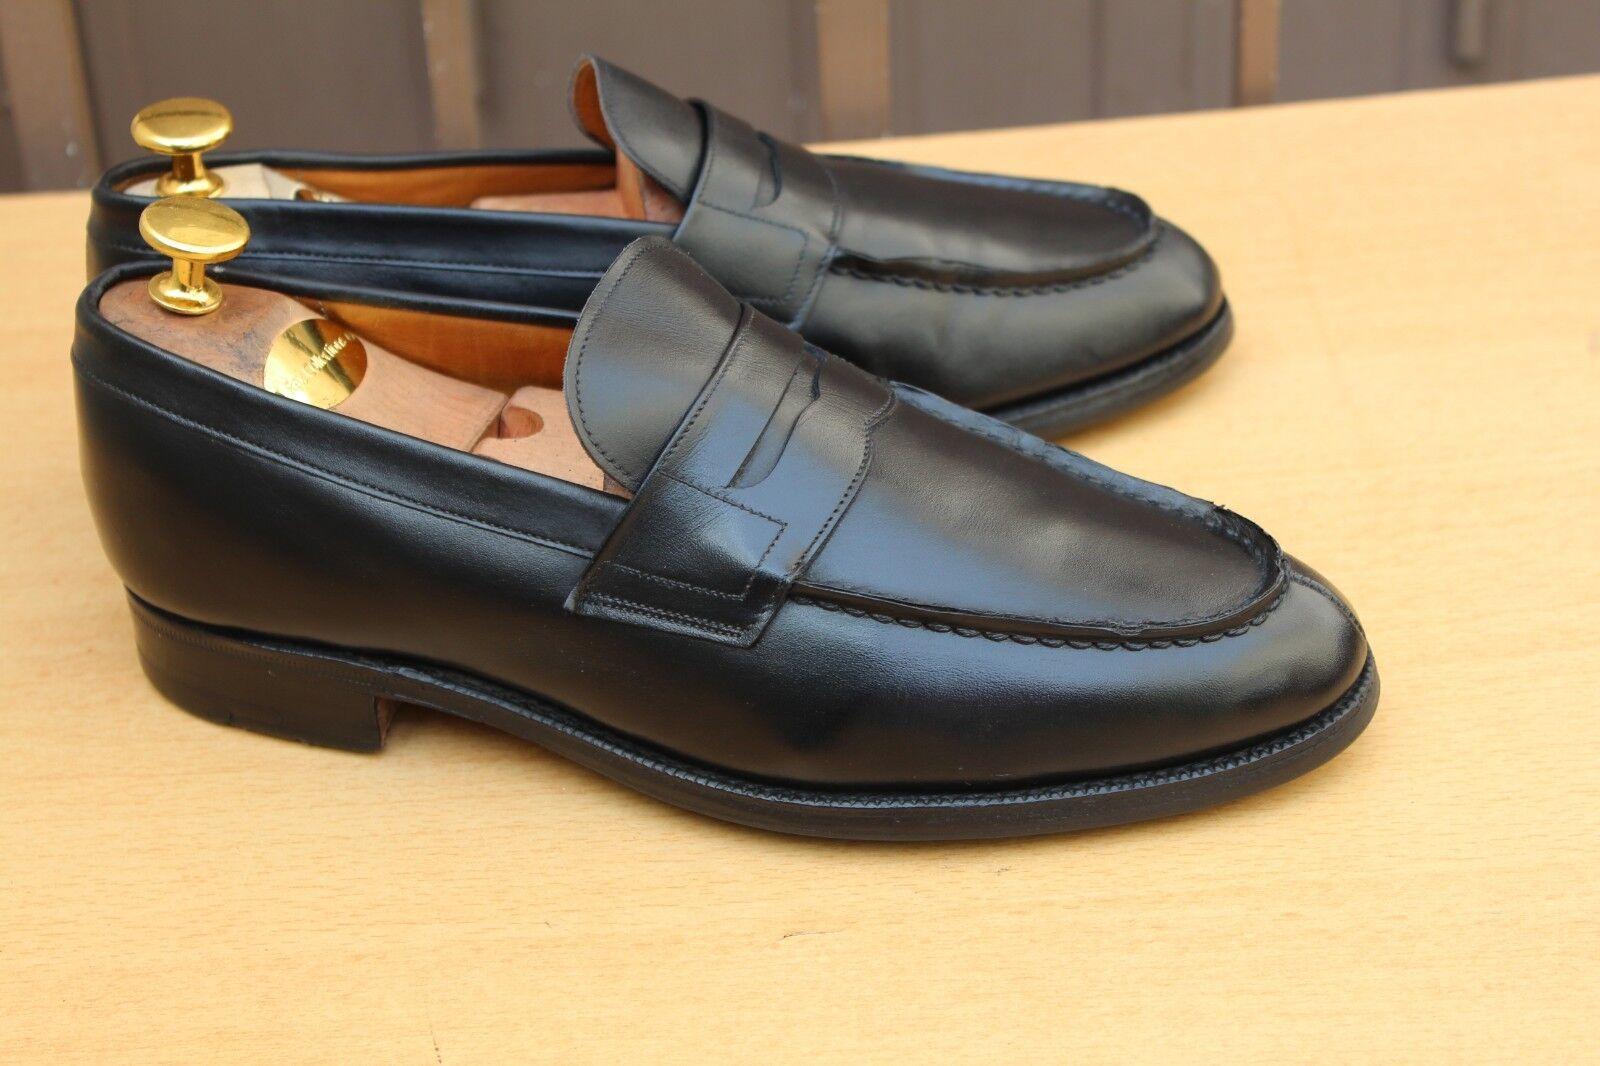 CHAUSSURE MOCASSIN CHURCH'S  KENT  CUIR 65 F 40,5 EXCELLENT ETAT hommes chaussures